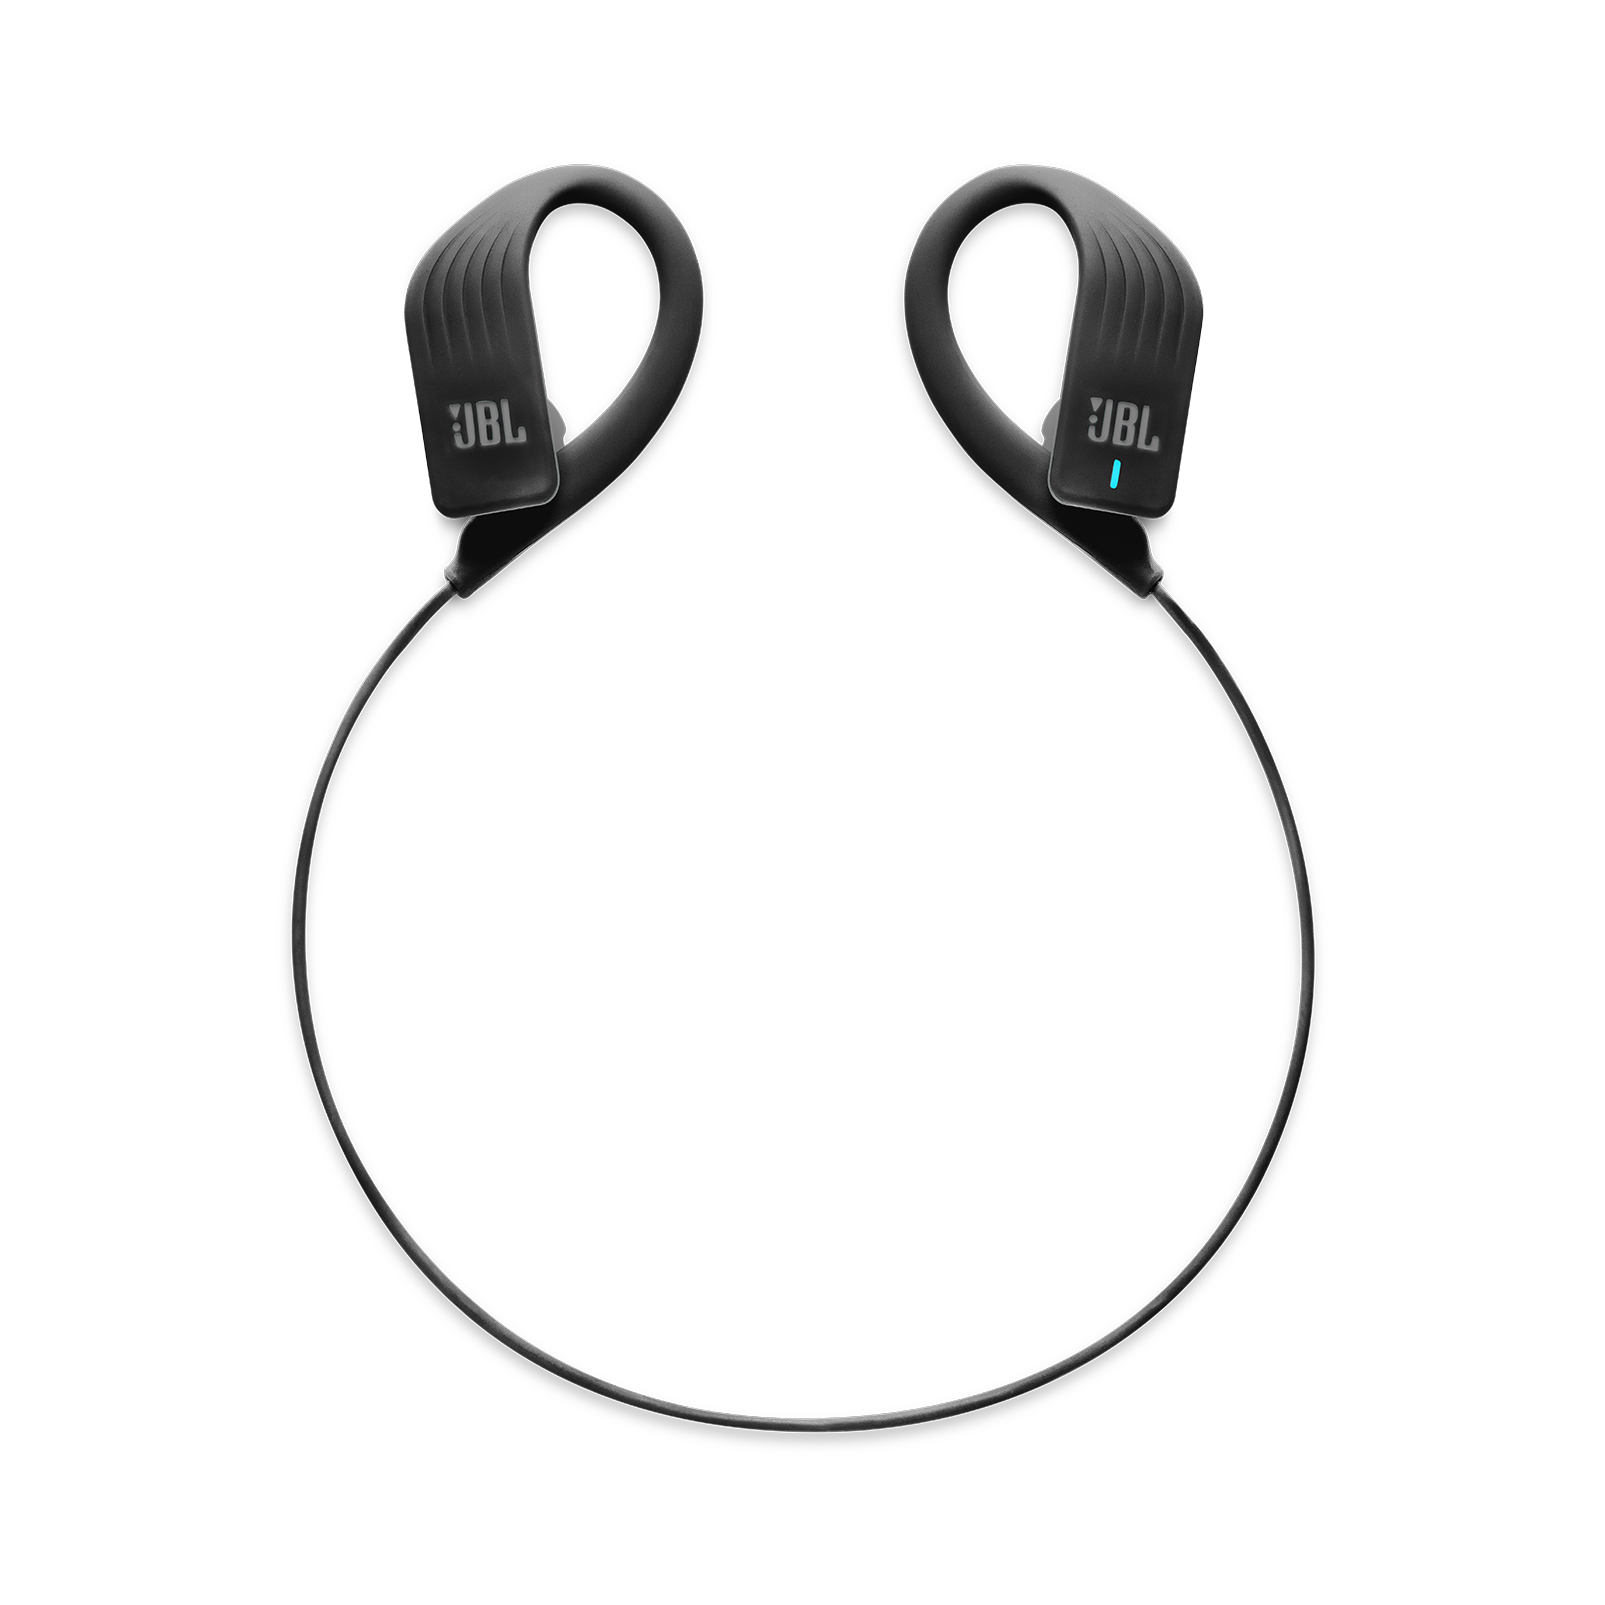 Jbl Endurance Sprint Waterproof Wireless In Ear Sport Headphones Block Diagram Of The Headphone Amplifier Ip Core